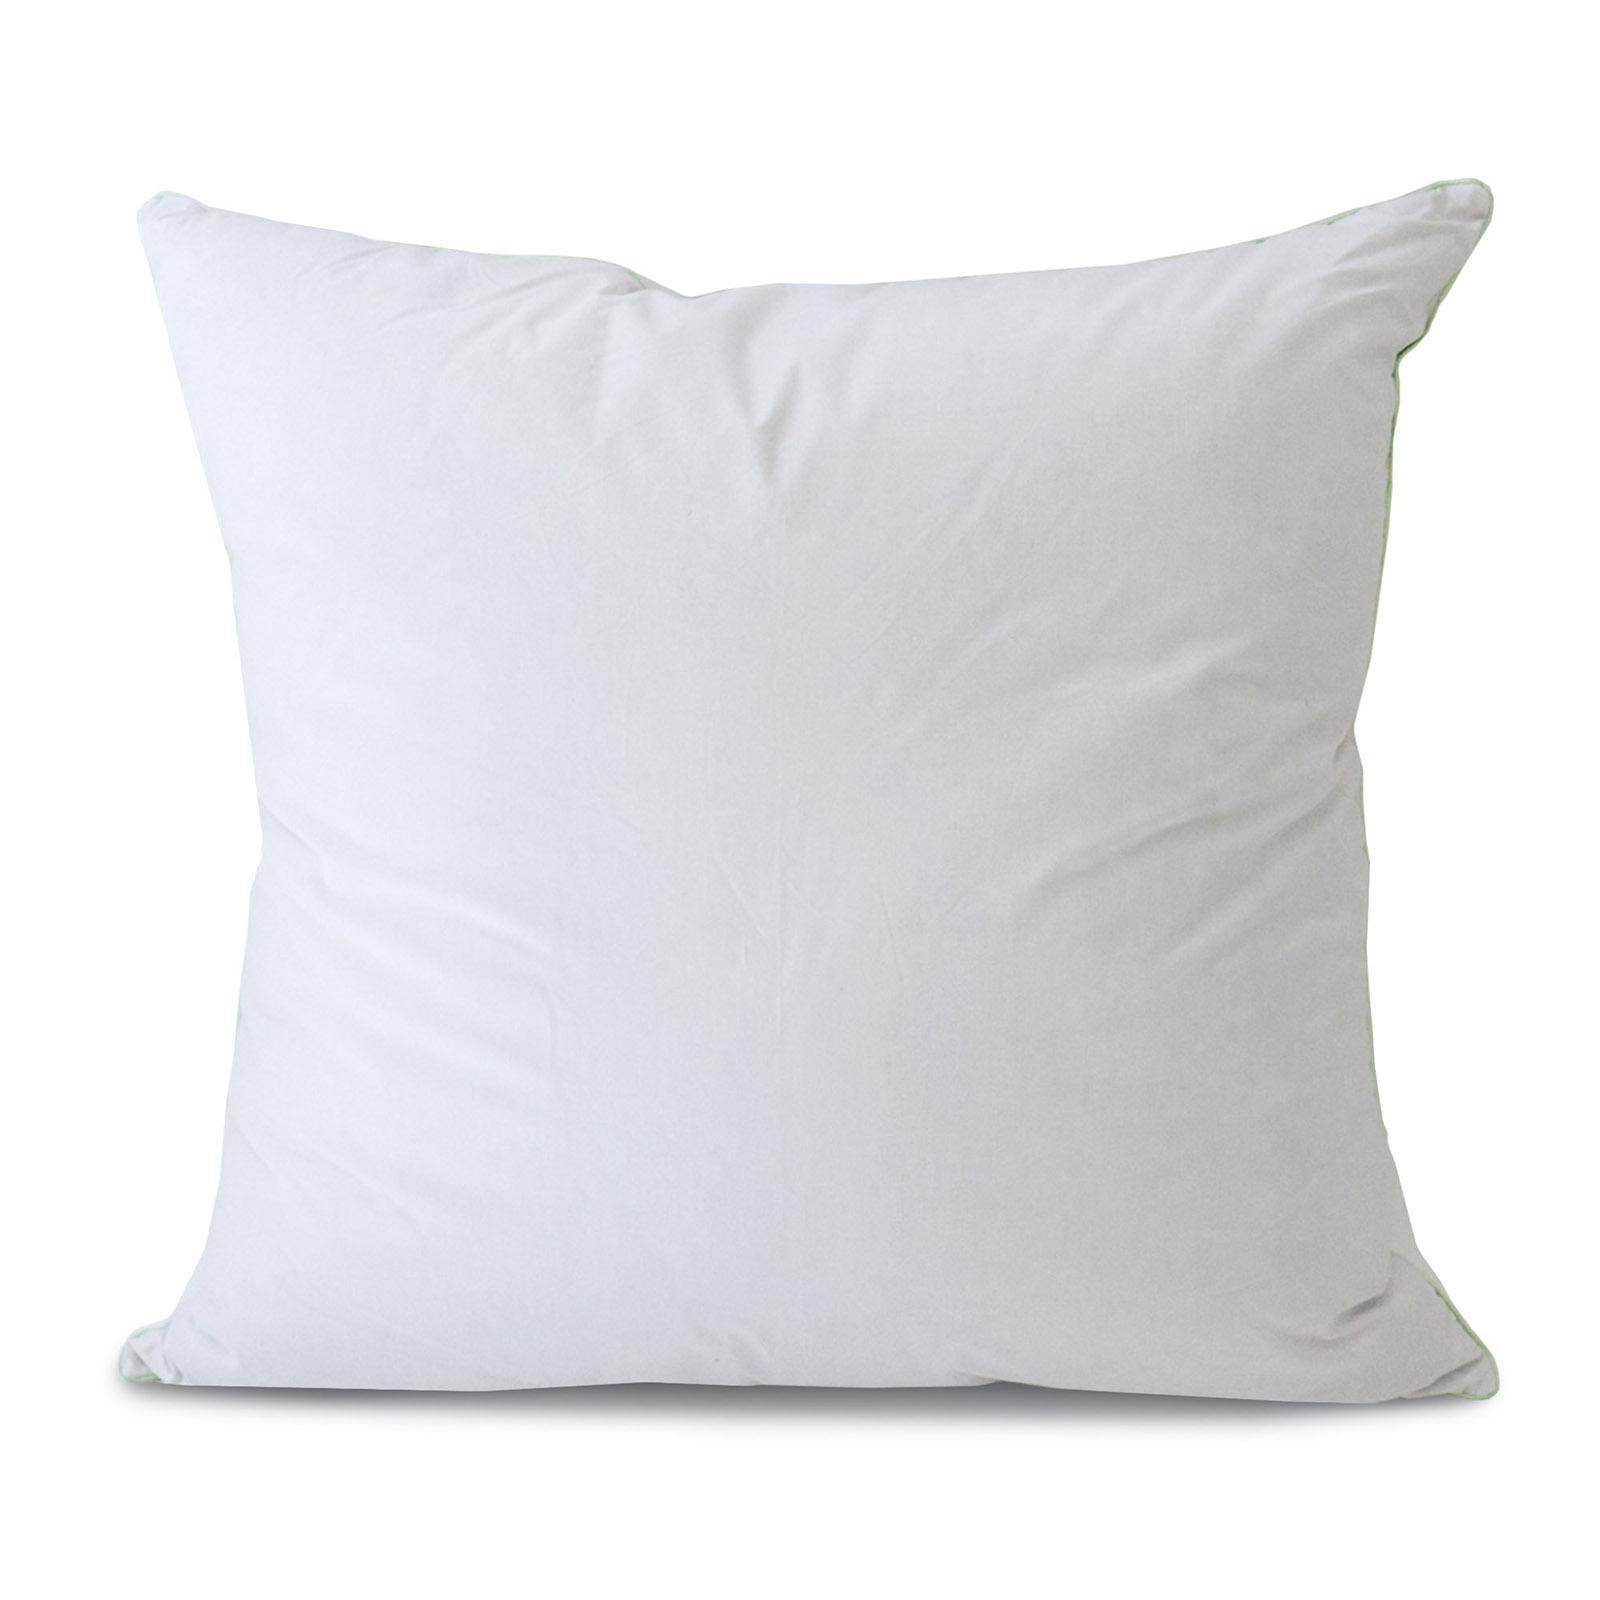 Подушка Kariguz 68x68 см